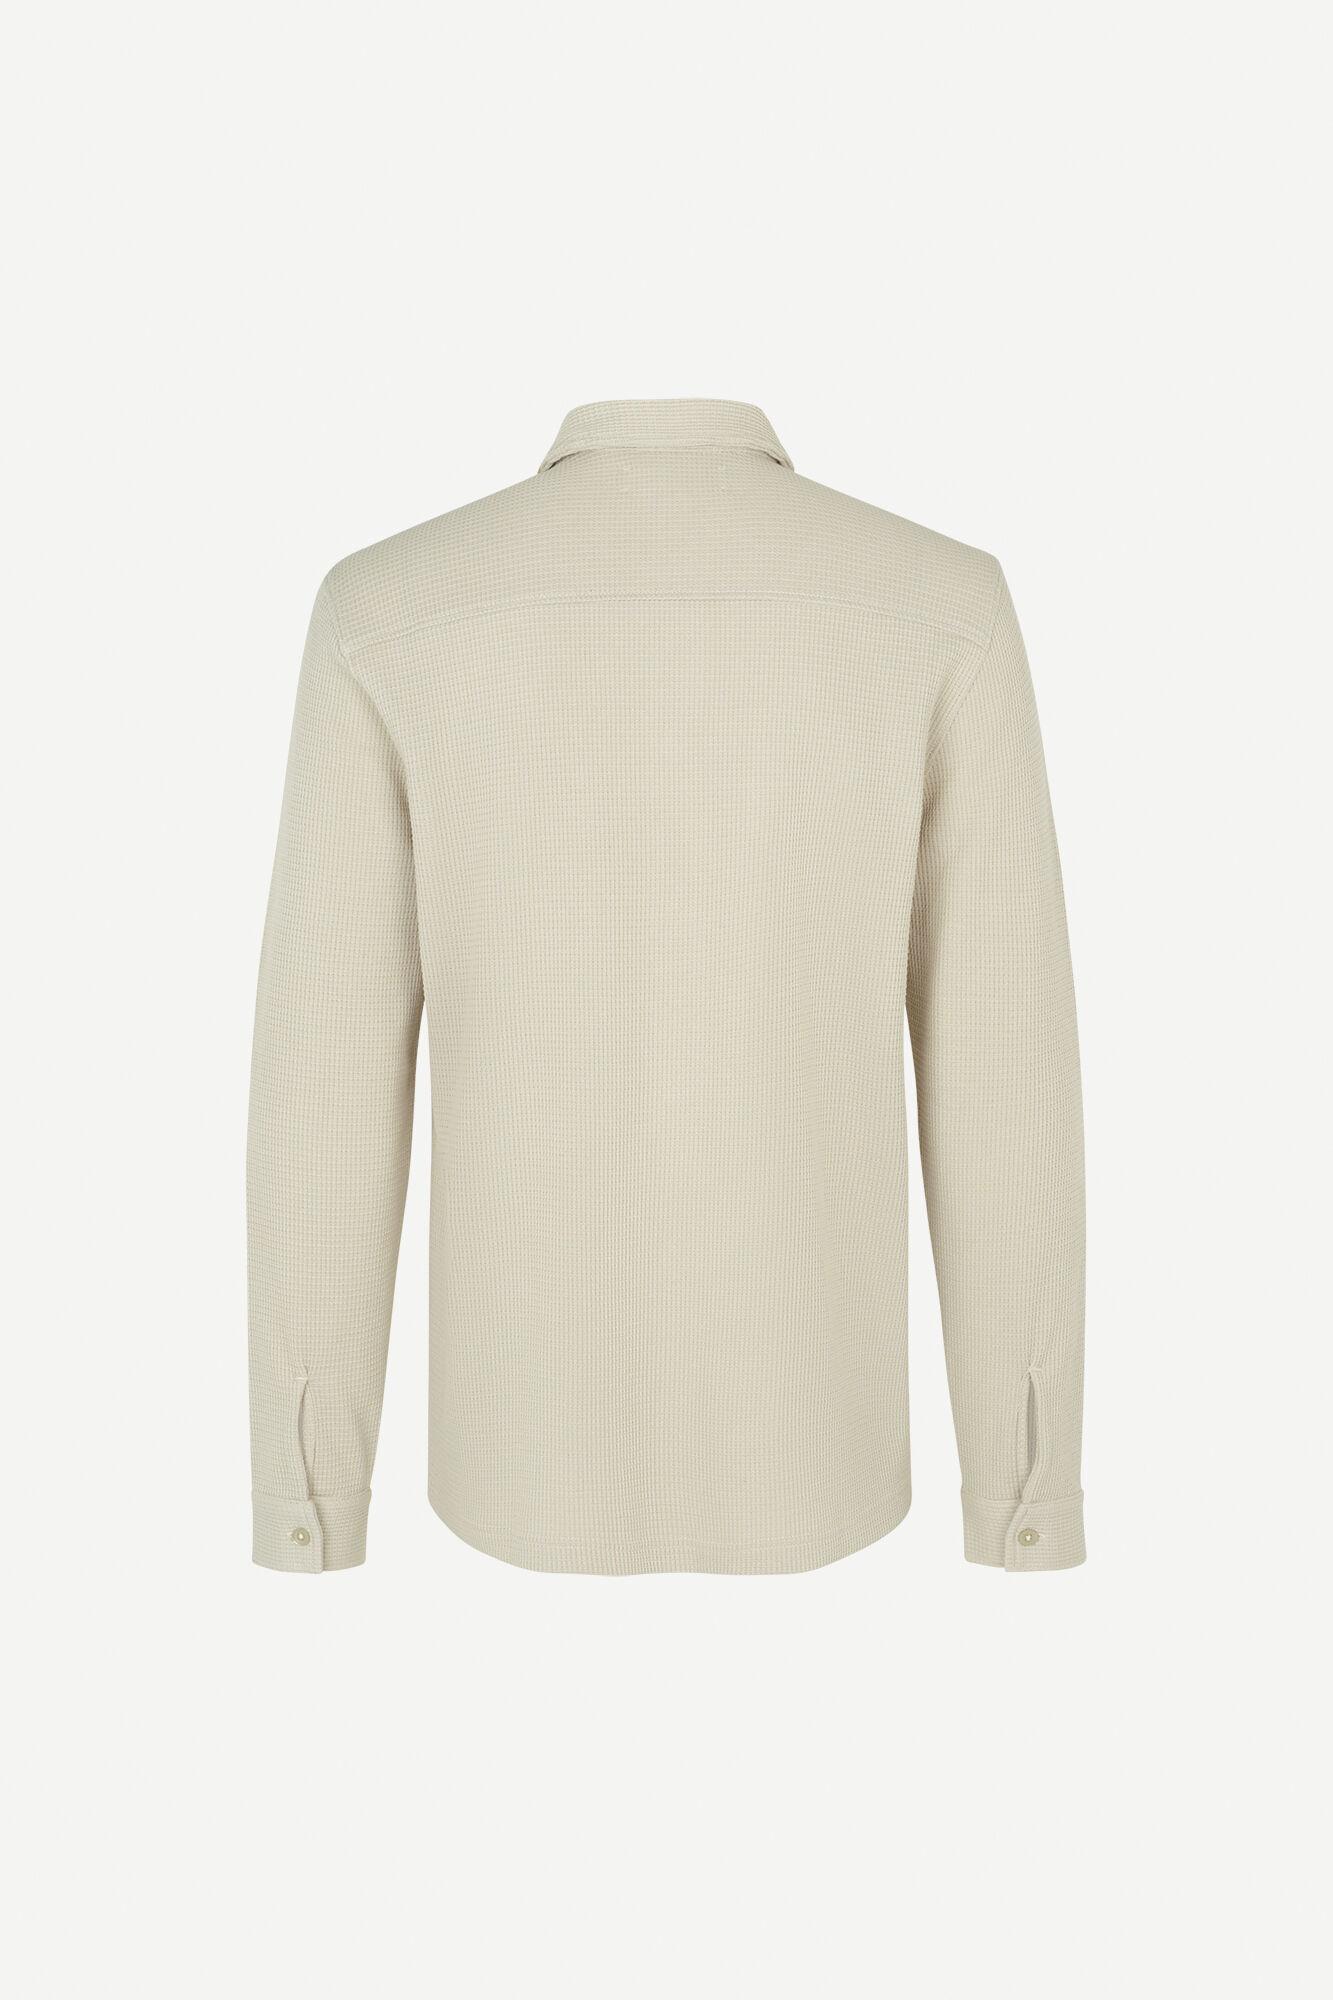 Dayo geweven overhemd in ecru 11586-2